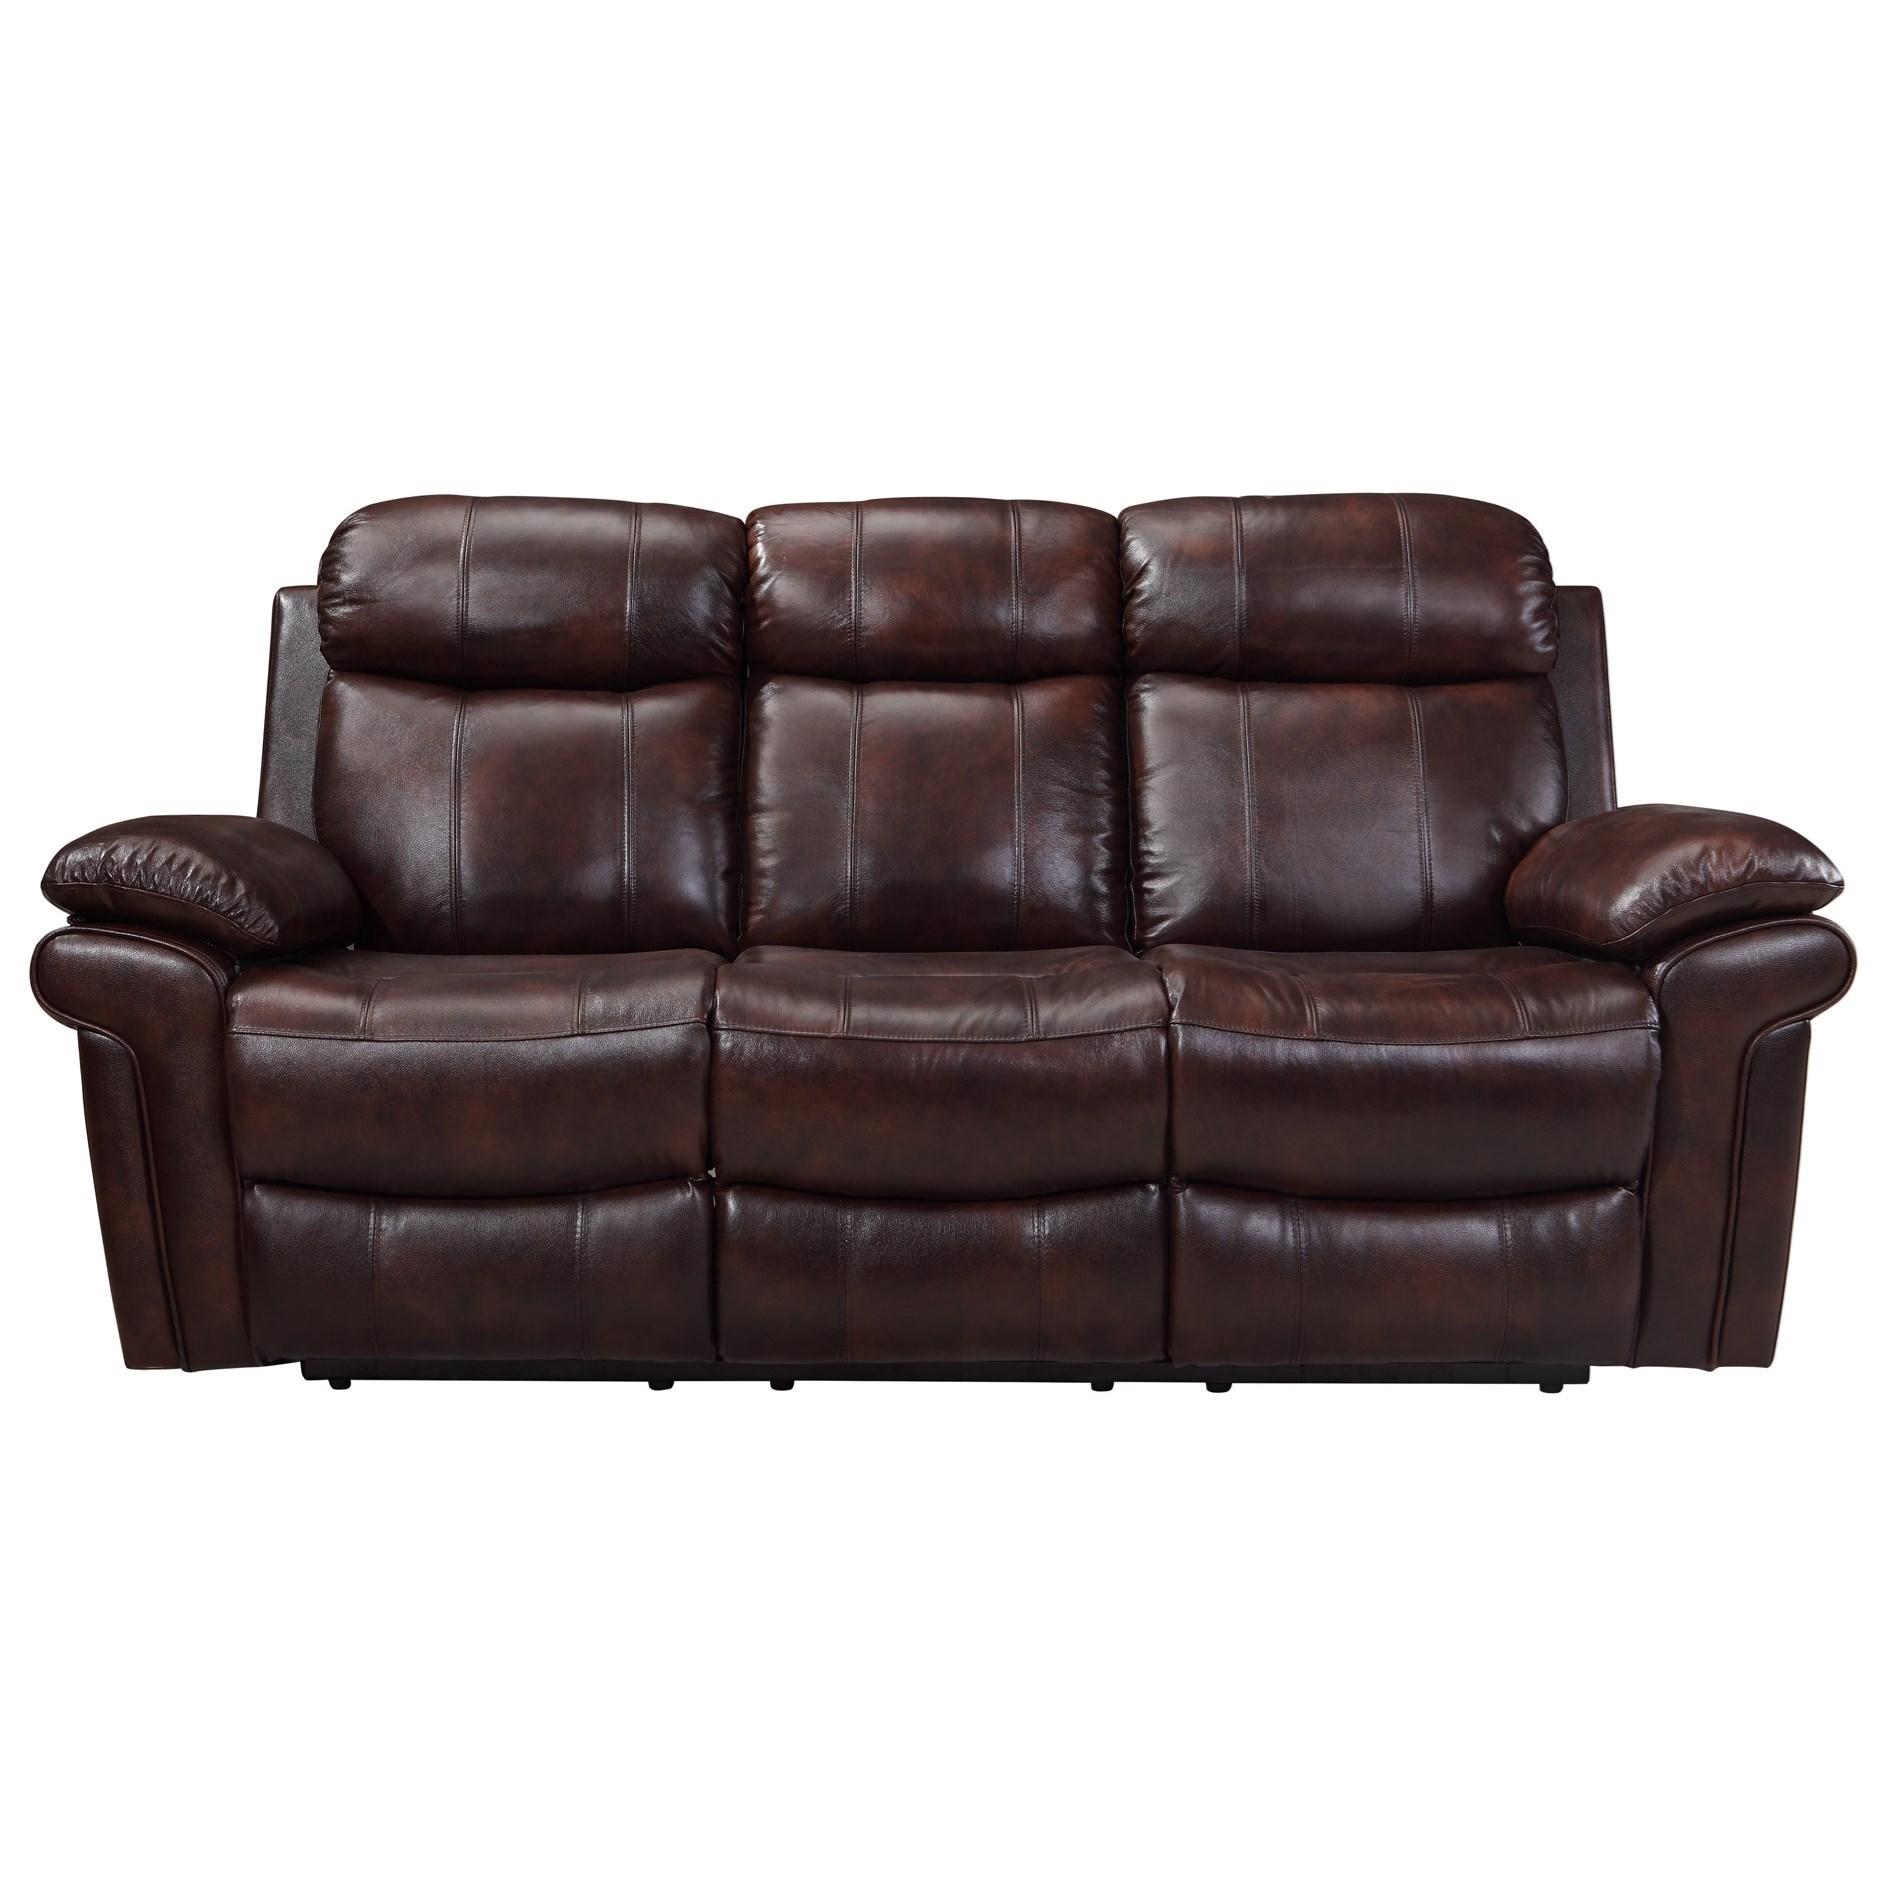 leather italia sofa furniture slipcover for queen sleeper usa shae joplin power reclining joplinpower